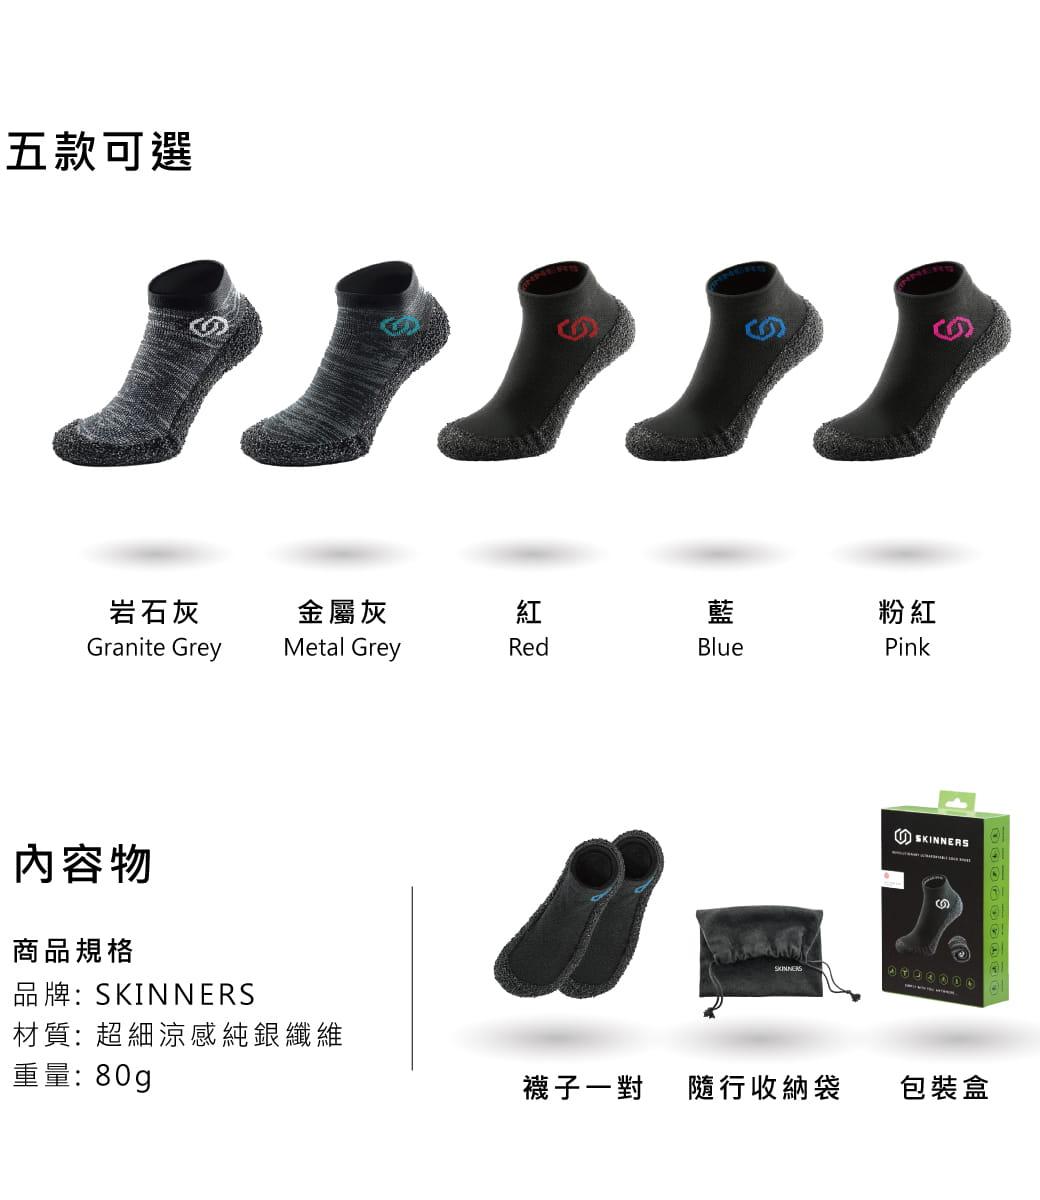 【Skinners】裸足感耐磨機能運動鞋襪-5色 9